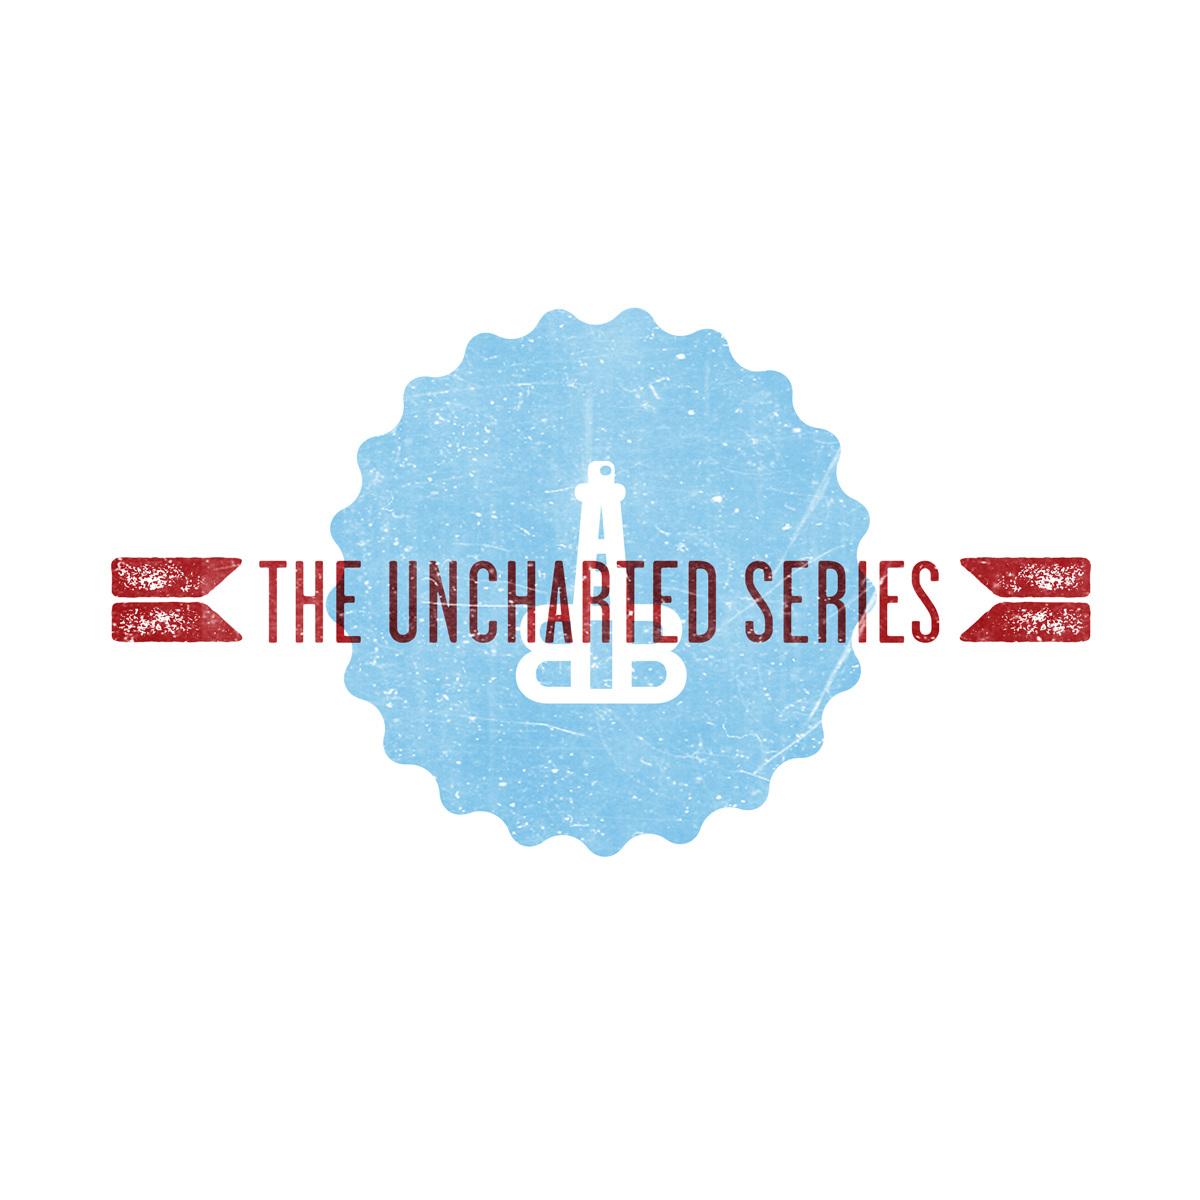 UnchartedSeries_1200.jpg